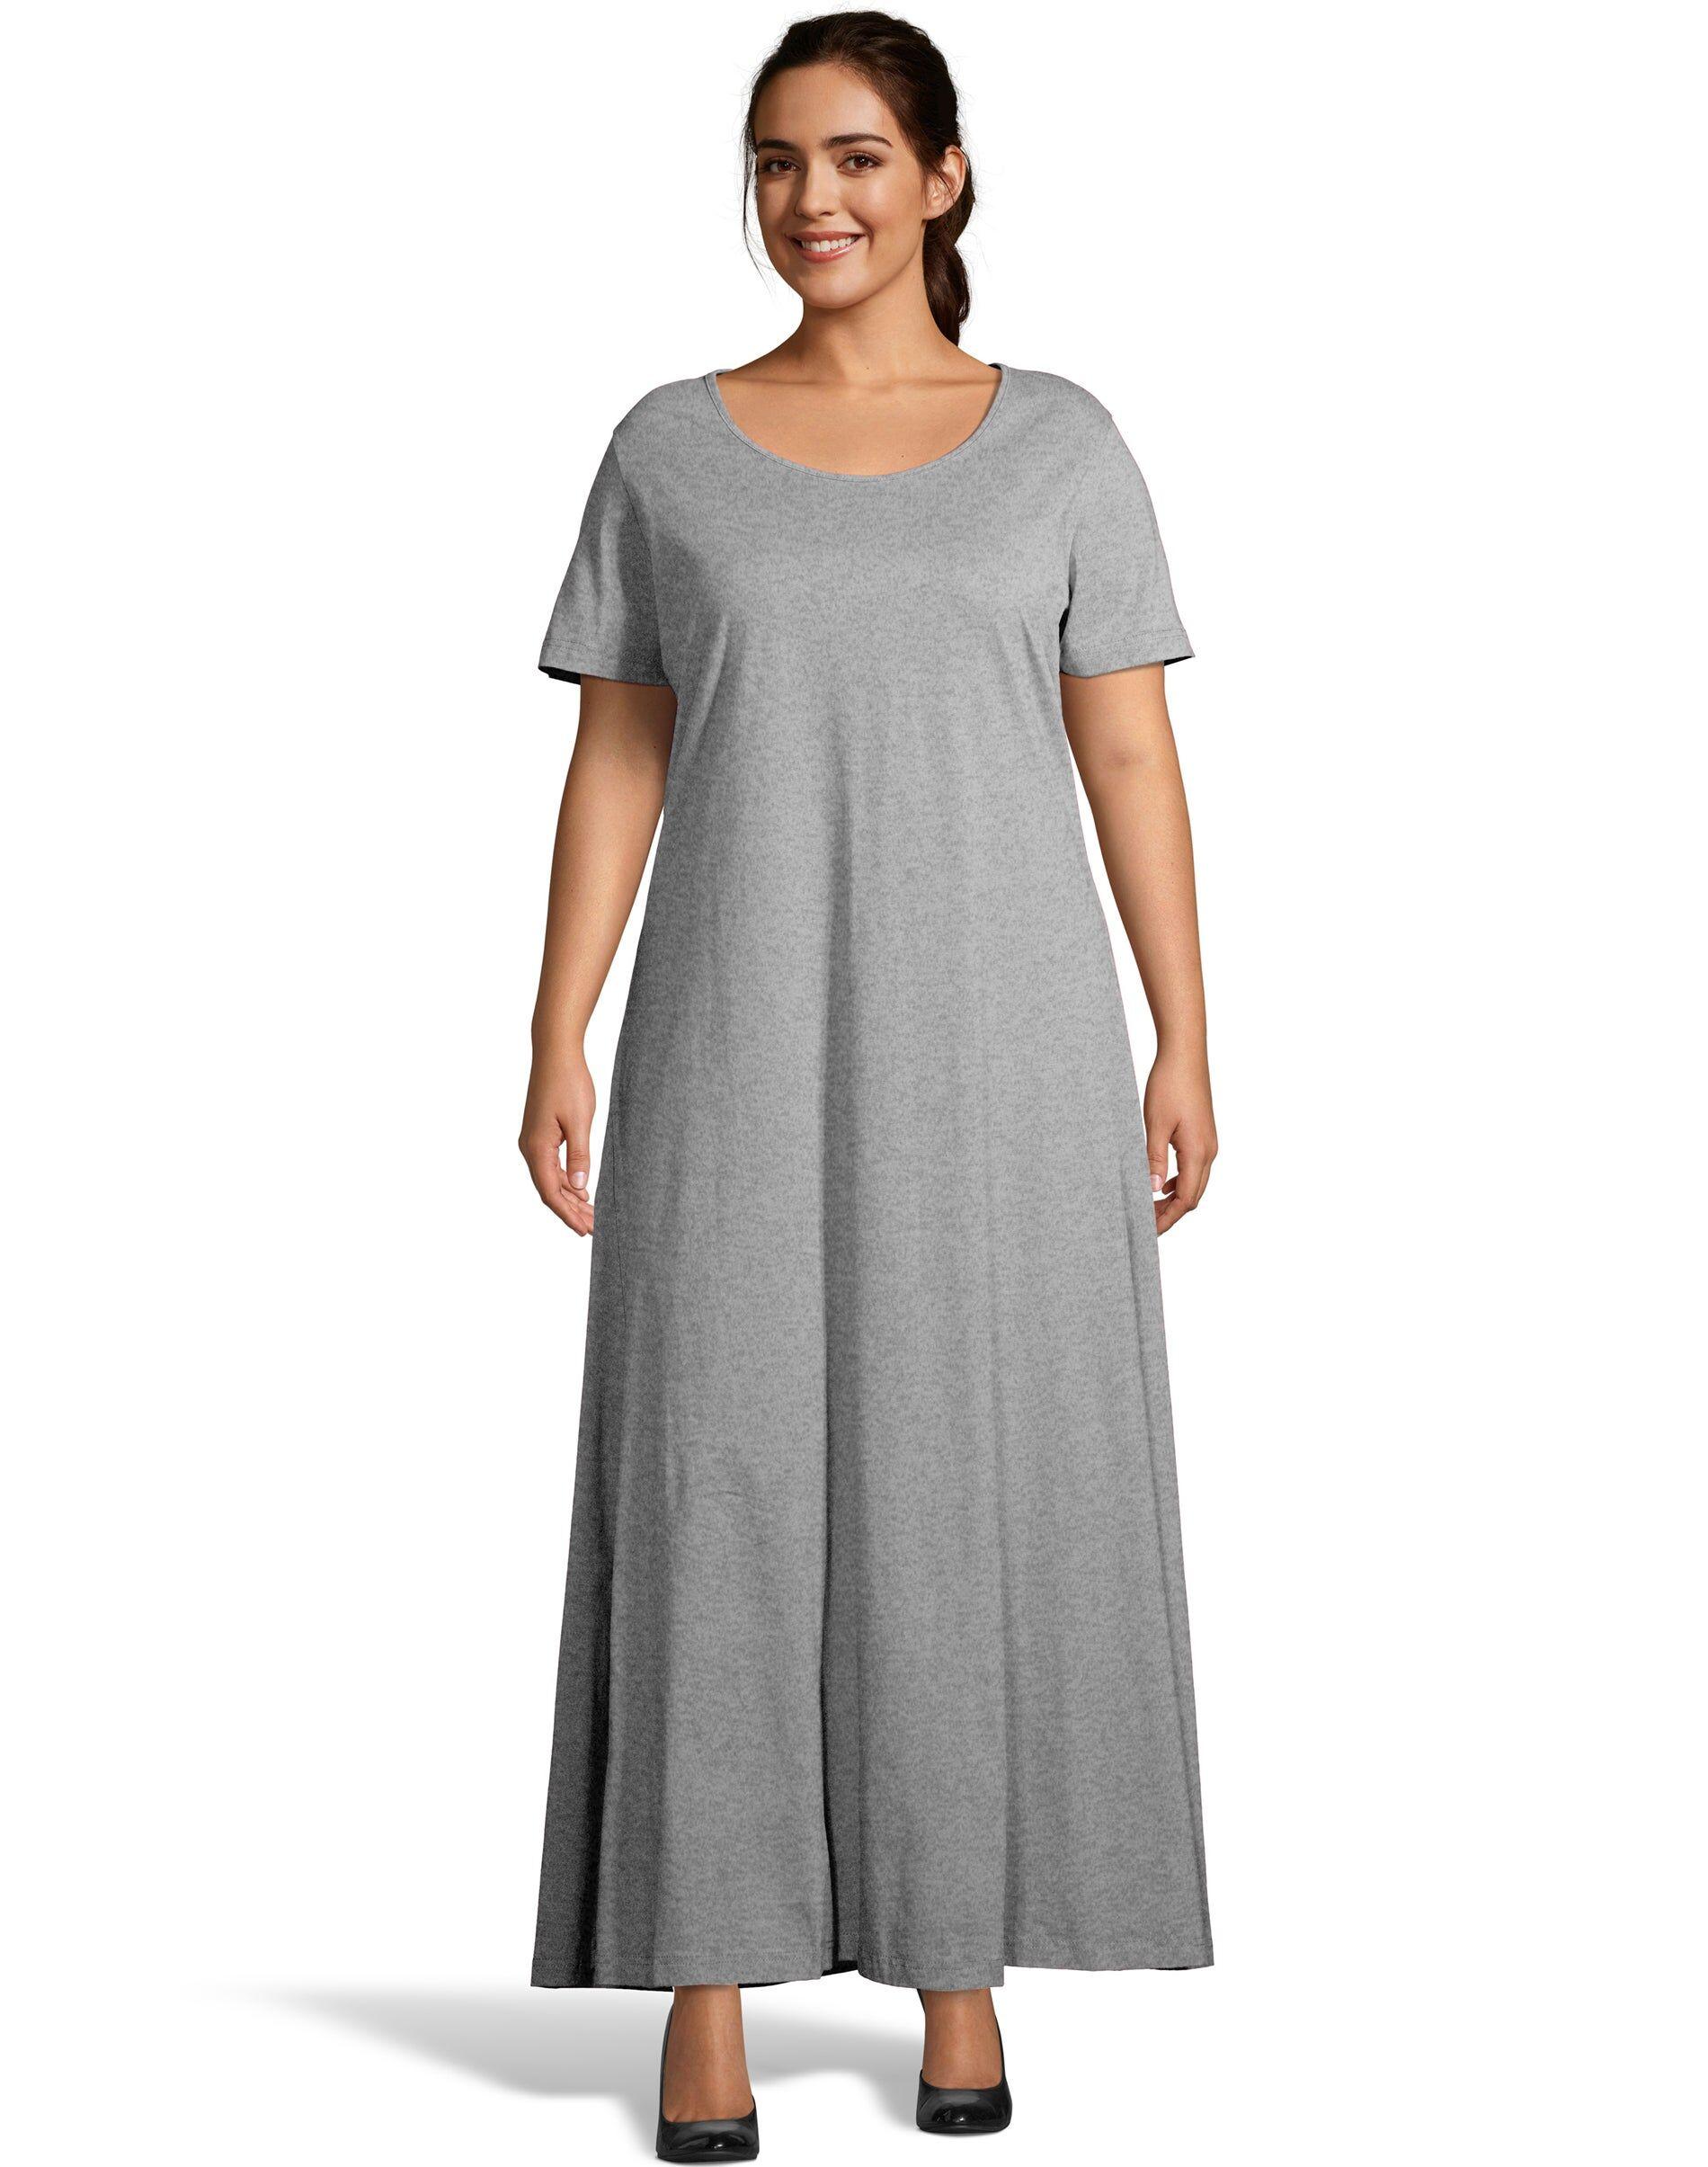 Just My Size Jersey Matchables Maxi Dress Grey Heather 1X Women's